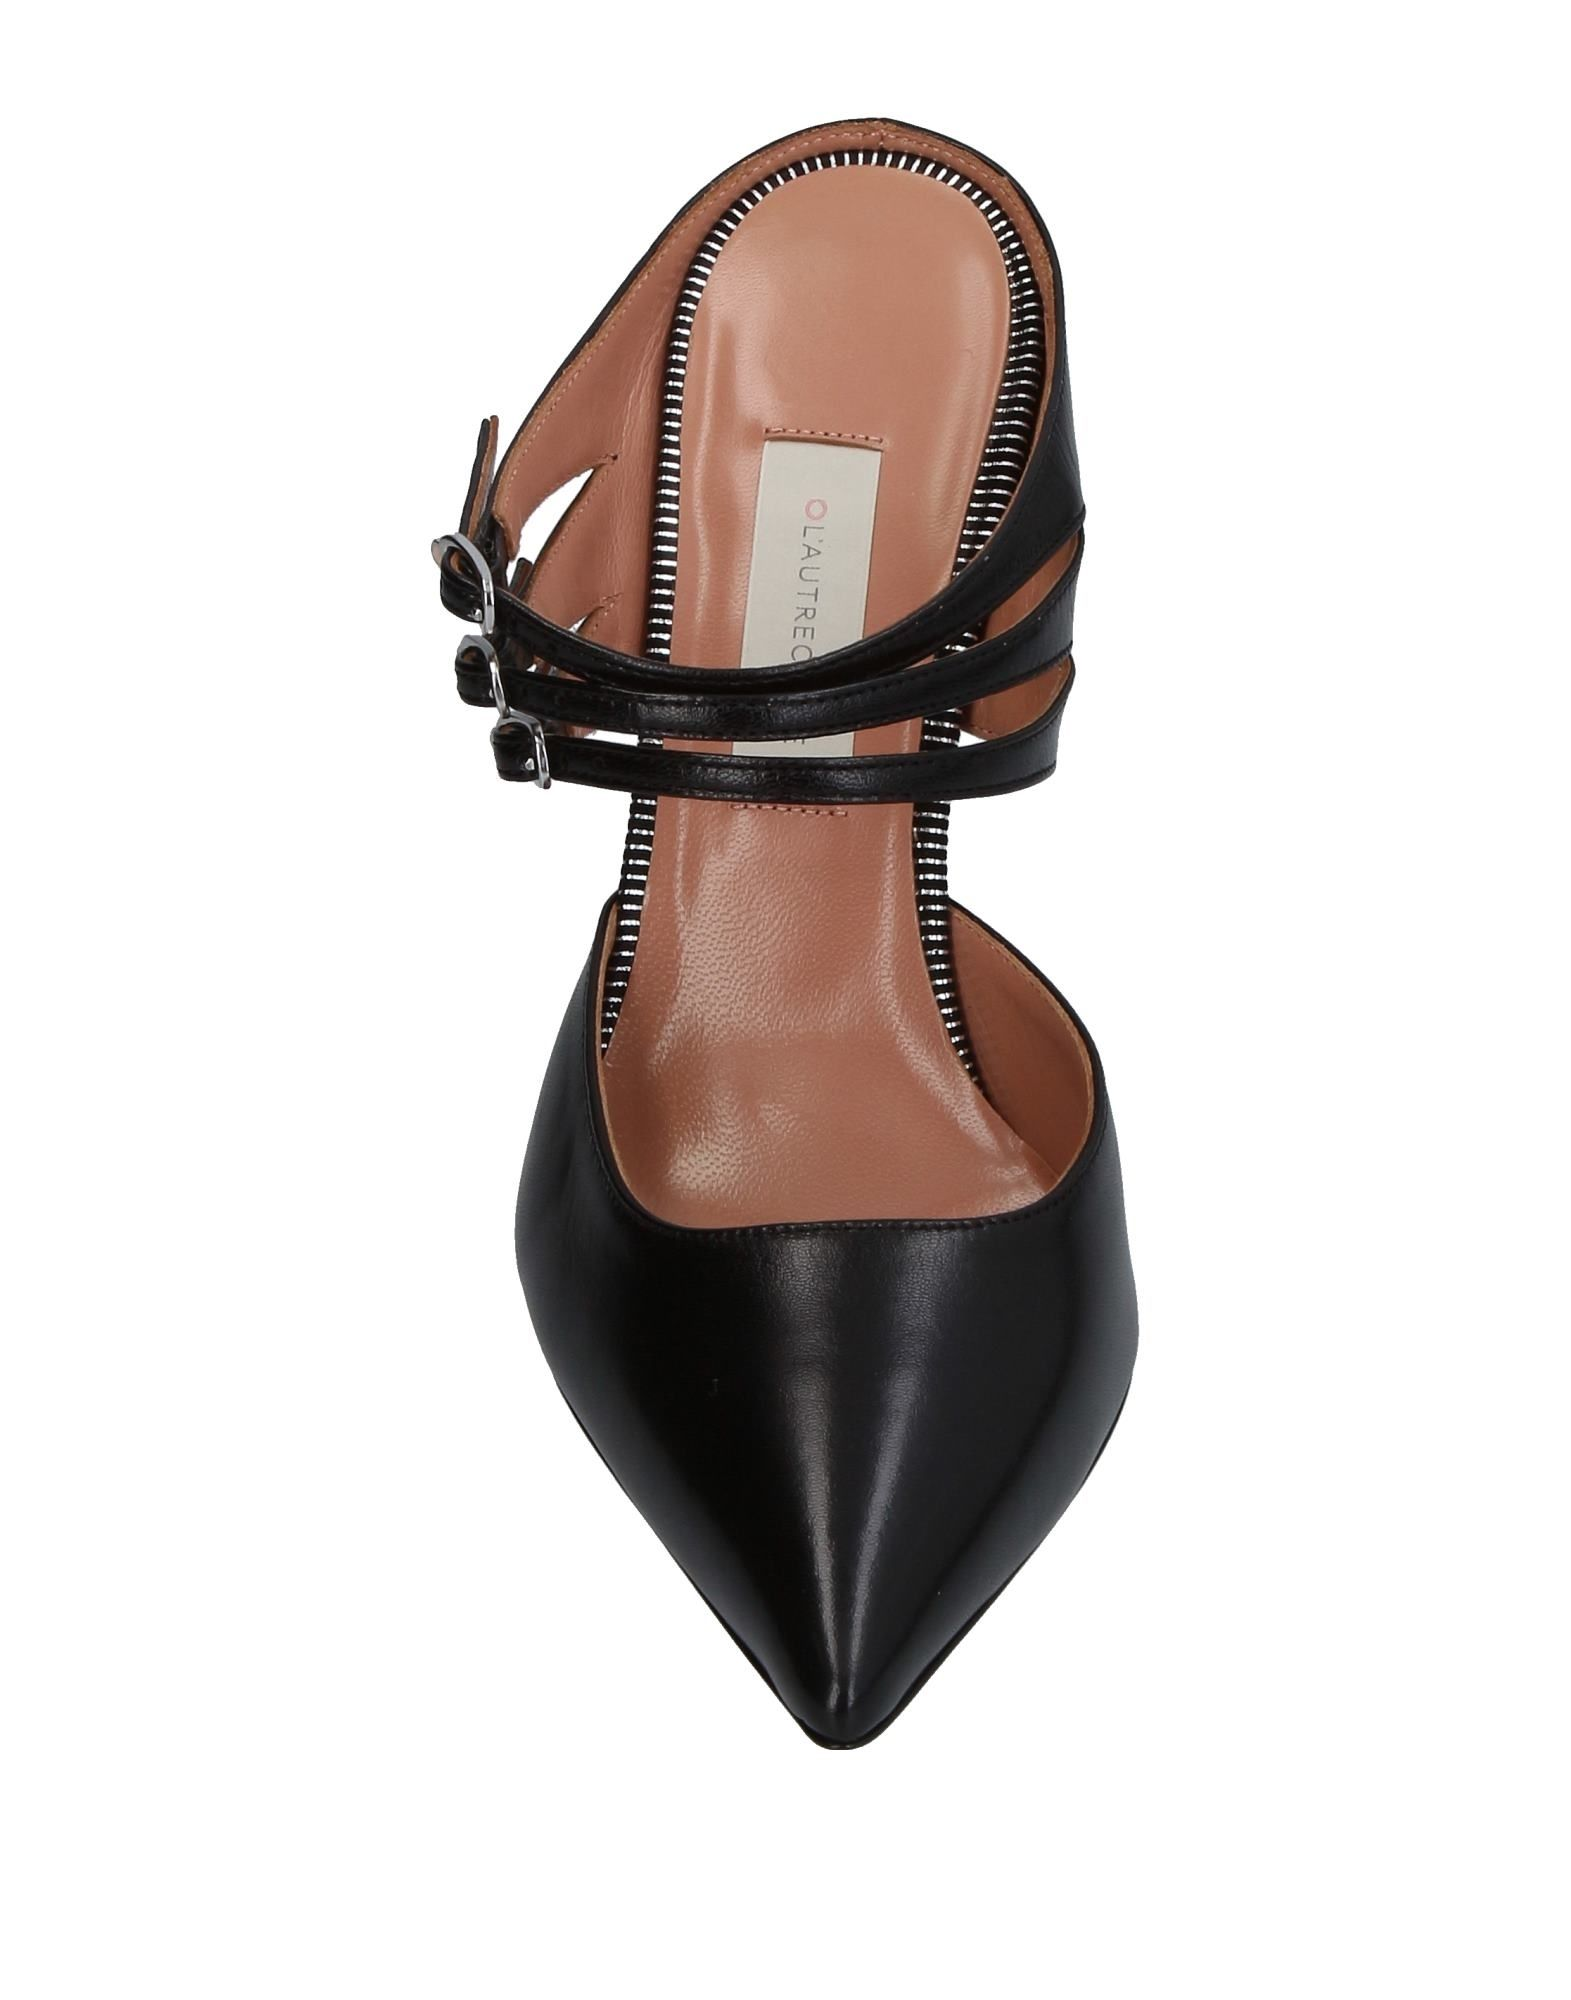 Stilvolle Stilvolle Stilvolle billige Schuhe L' Autre Chose Pantoletten Damen  11383790CD 79d544